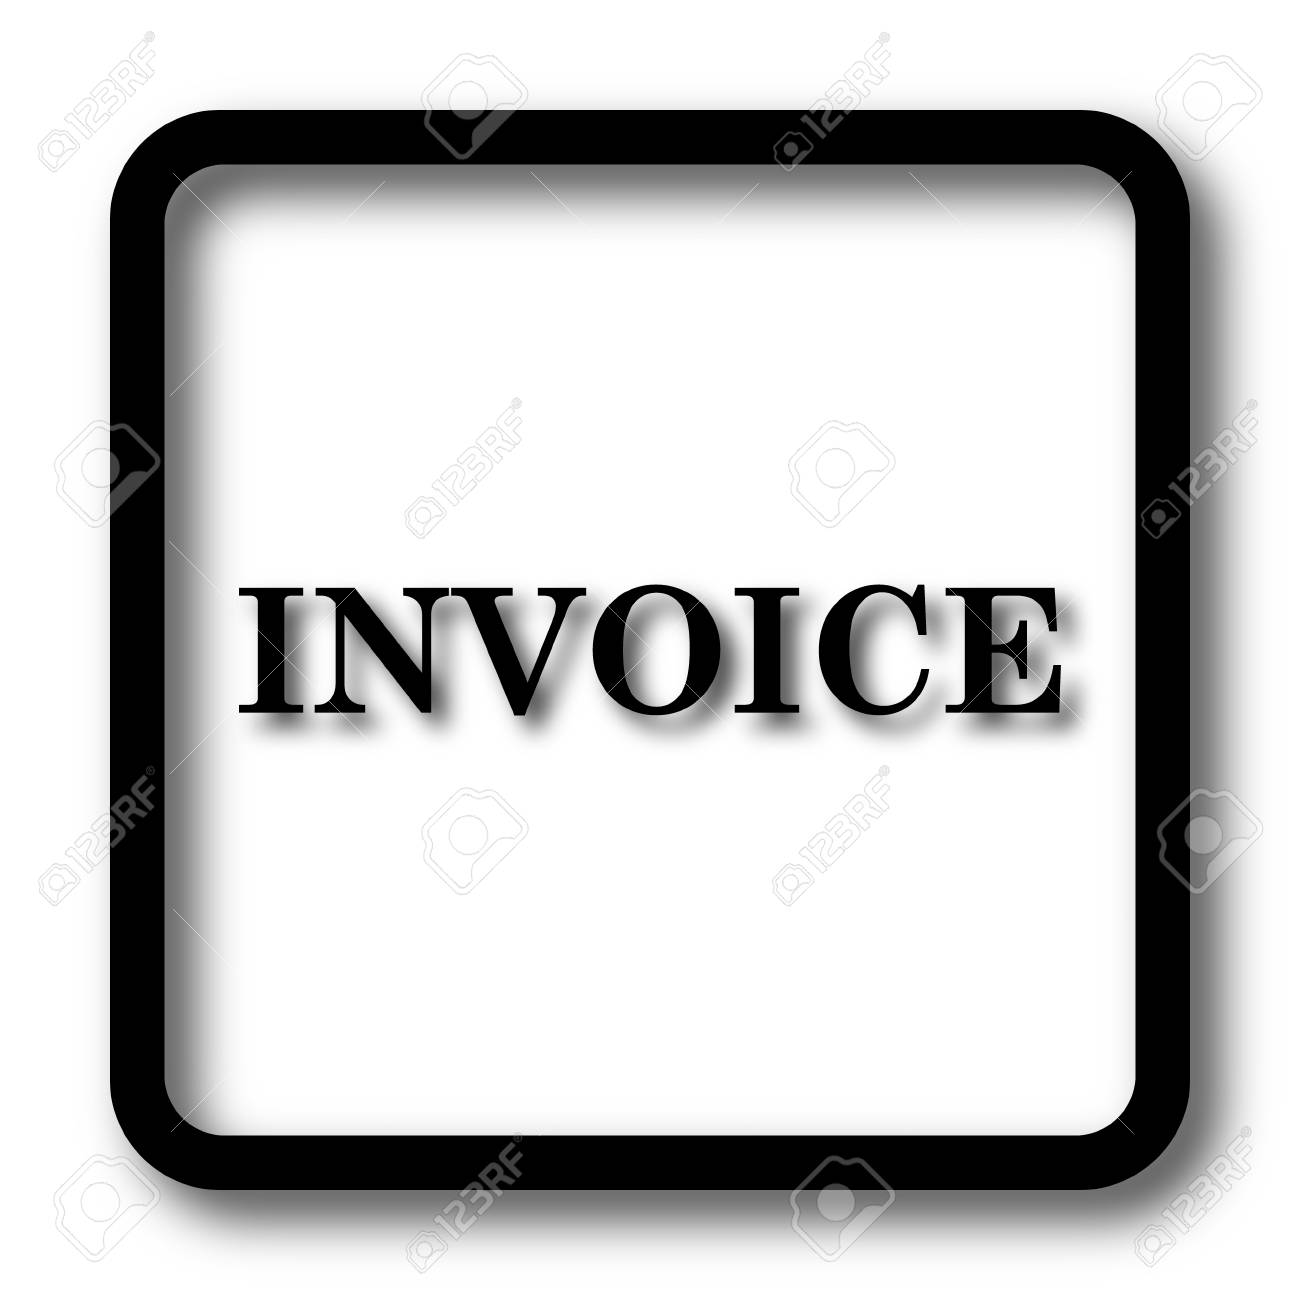 invoice icon black website button on white background stock photo 67226392